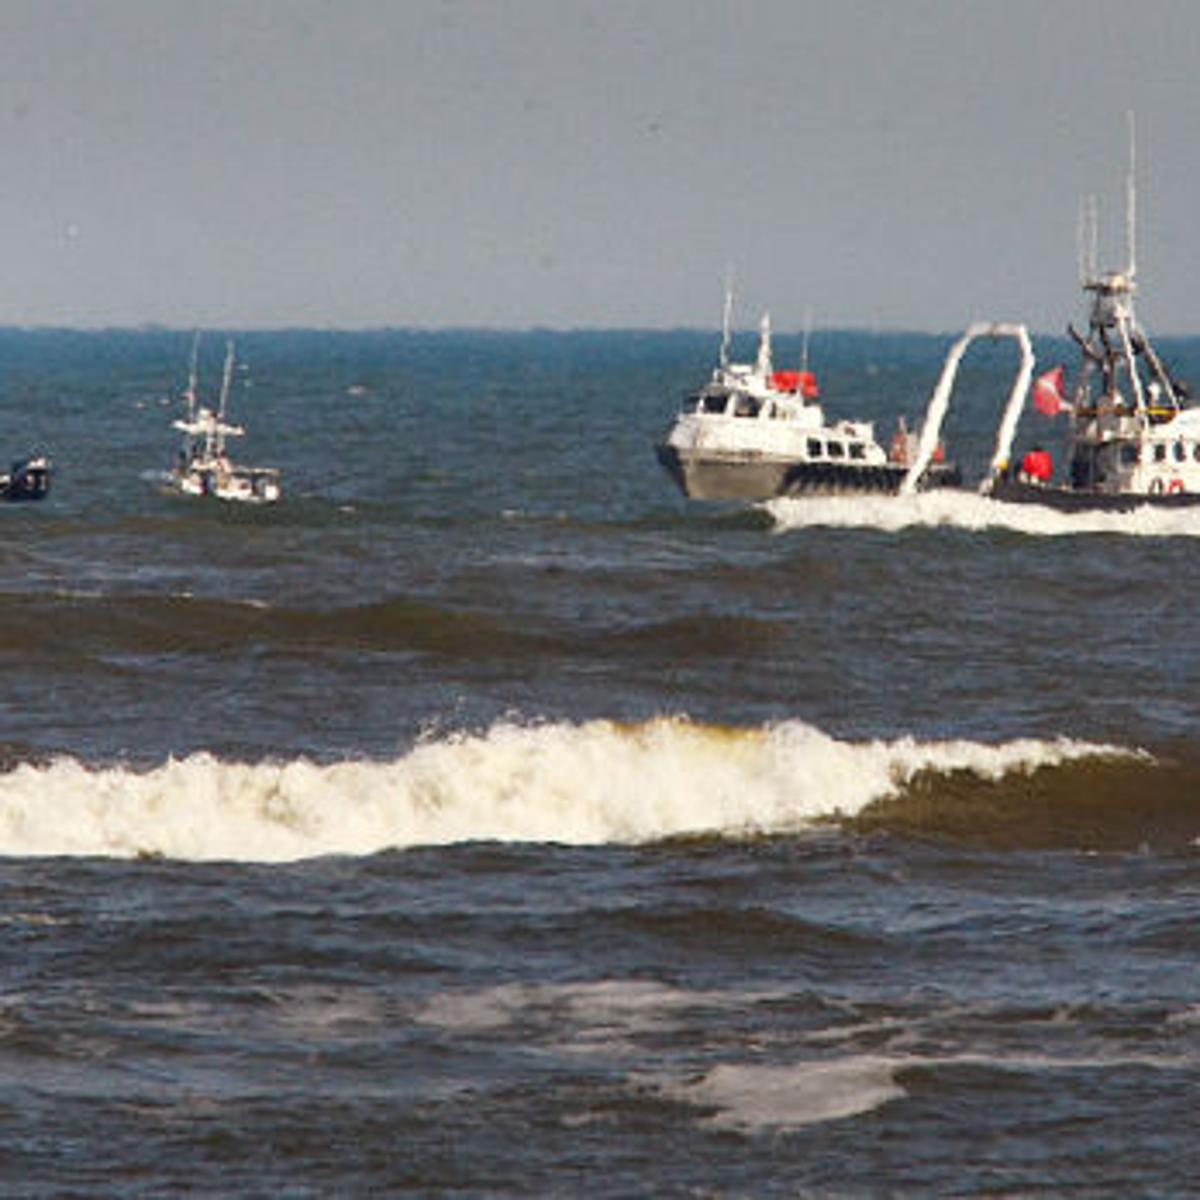 Life Jacket Might Have Saved Lost Sea Tow Captain S Life Latest Headlines Pressofatlanticcity Com